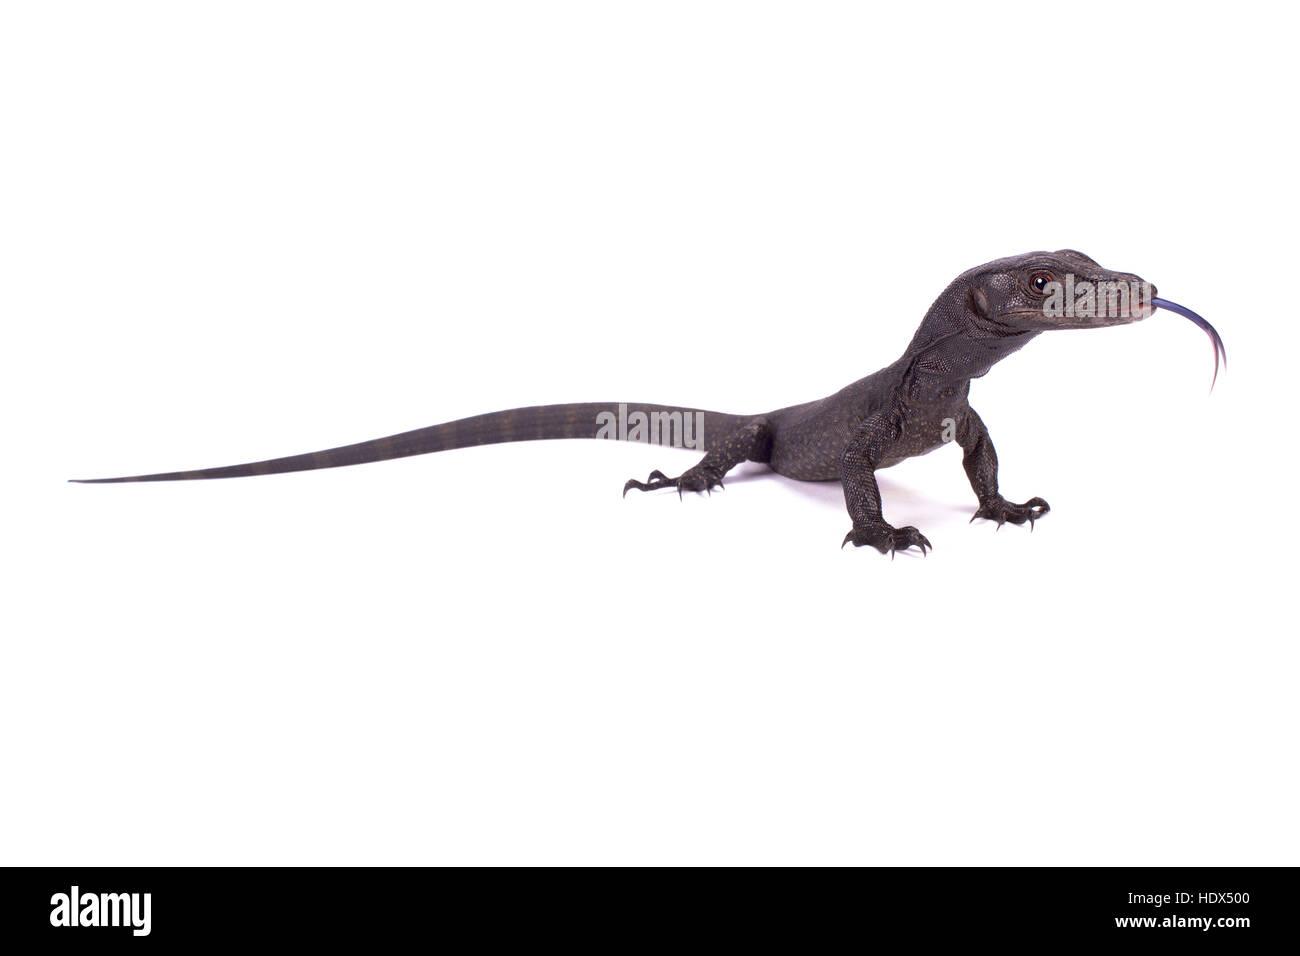 Monitor de aguas negras, Varanus salvator komaini Imagen De Stock